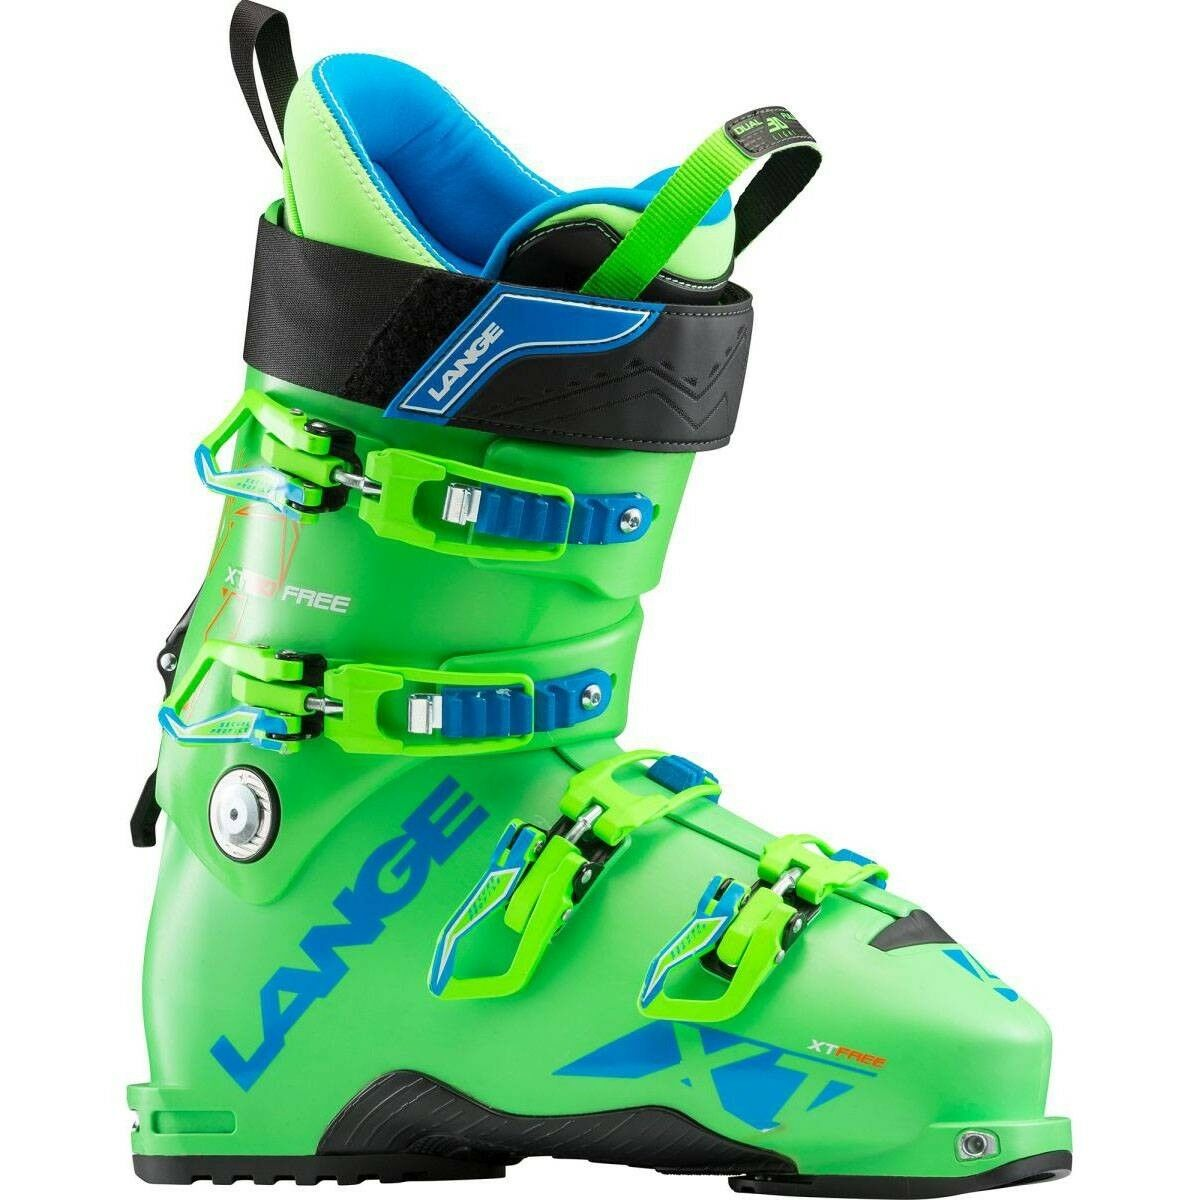 Lange XT Free 130 Skischuhe grün